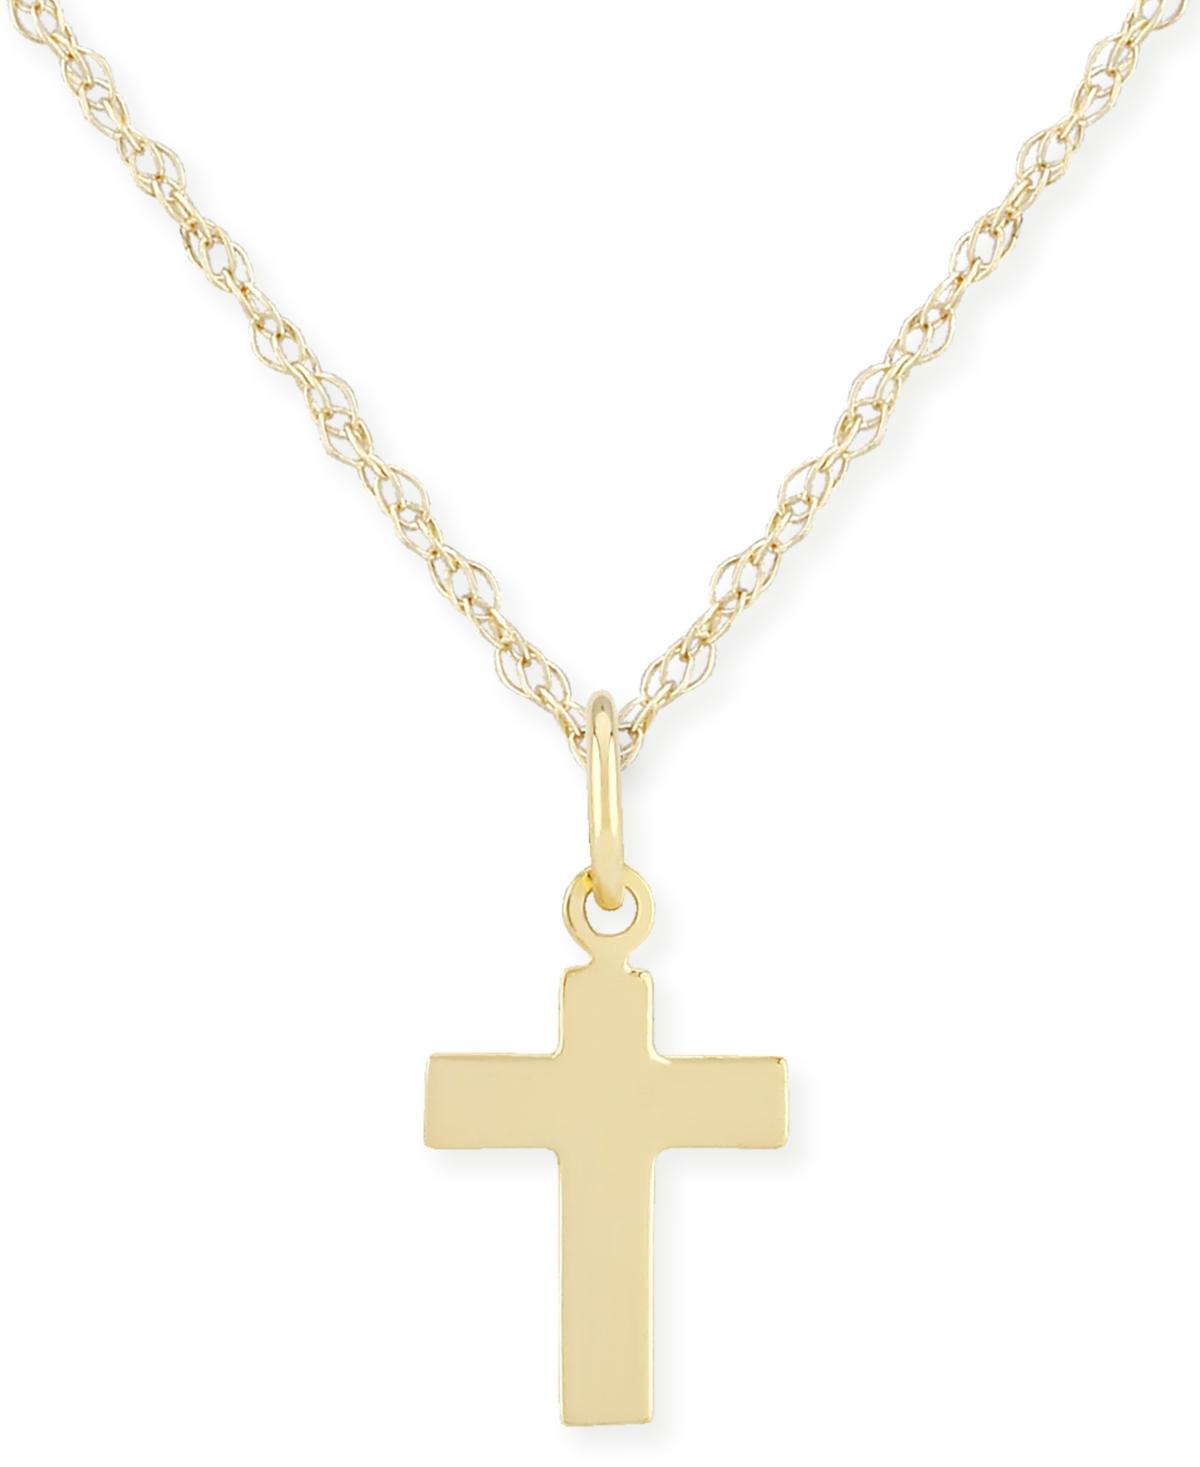 Flat Cross Necklace Set in 14k Gold